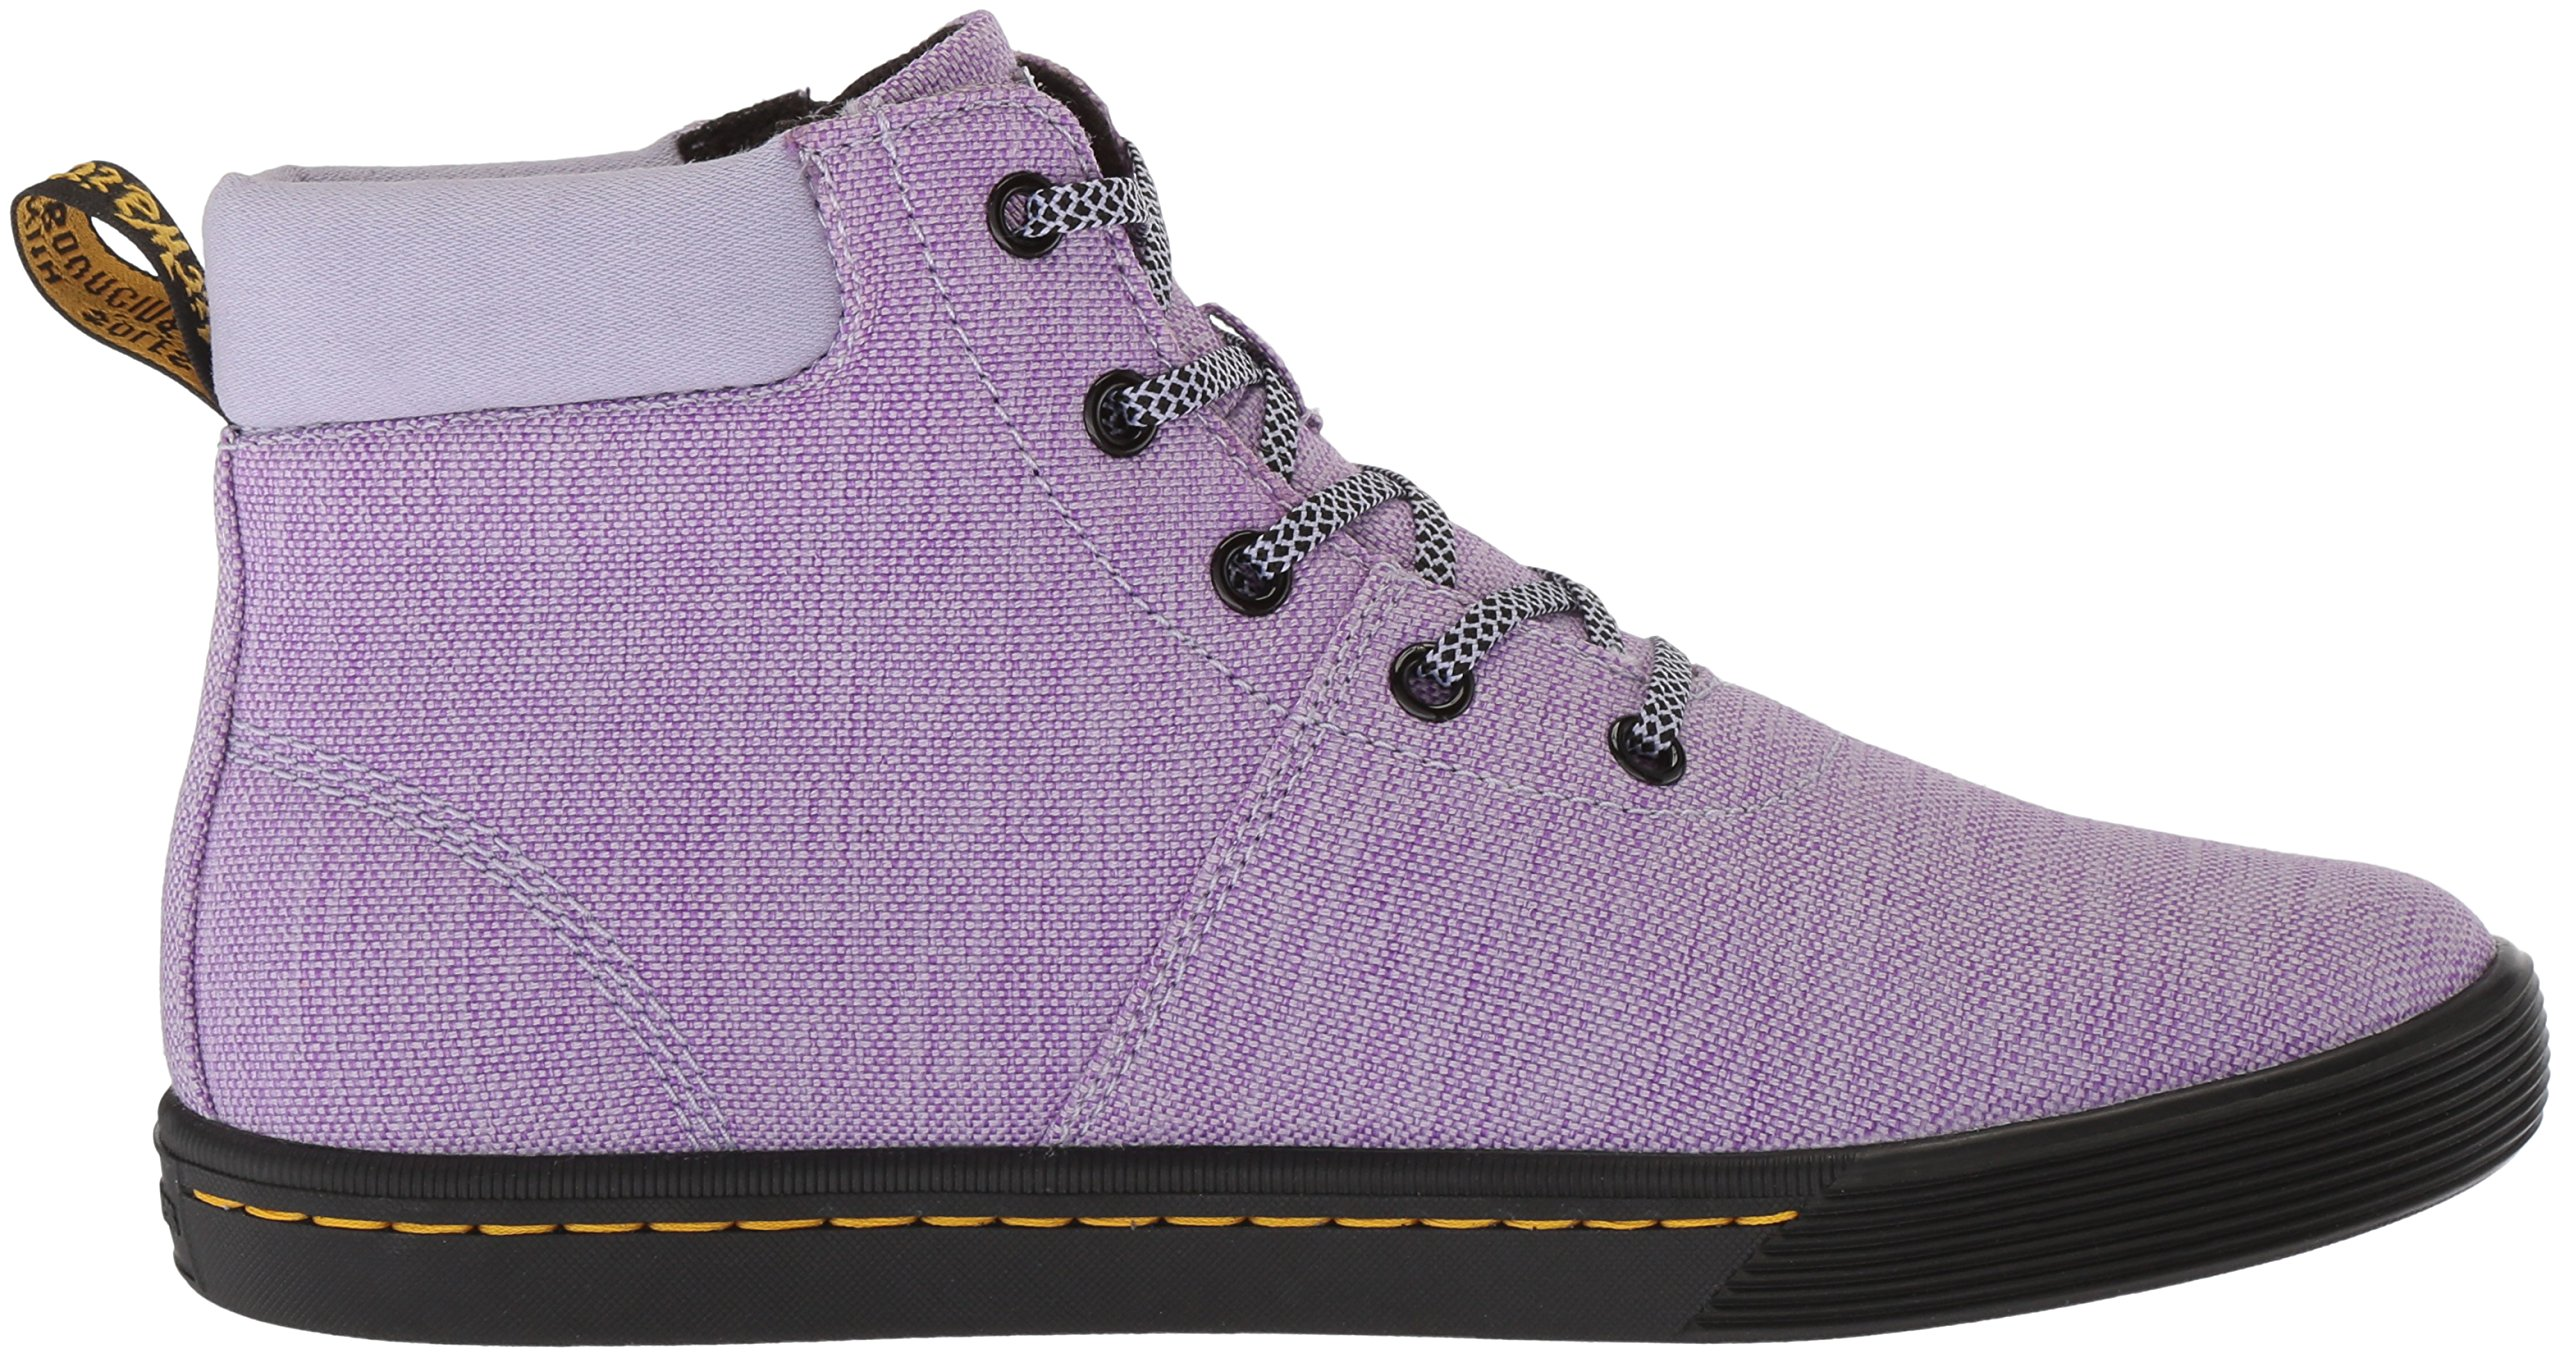 Dr. Martens Women's Maegley Fashion Boot, Purple Heather Woven Textile+Fine Canvas, 6 Medium UK (8 US) by Dr. Martens (Image #6)